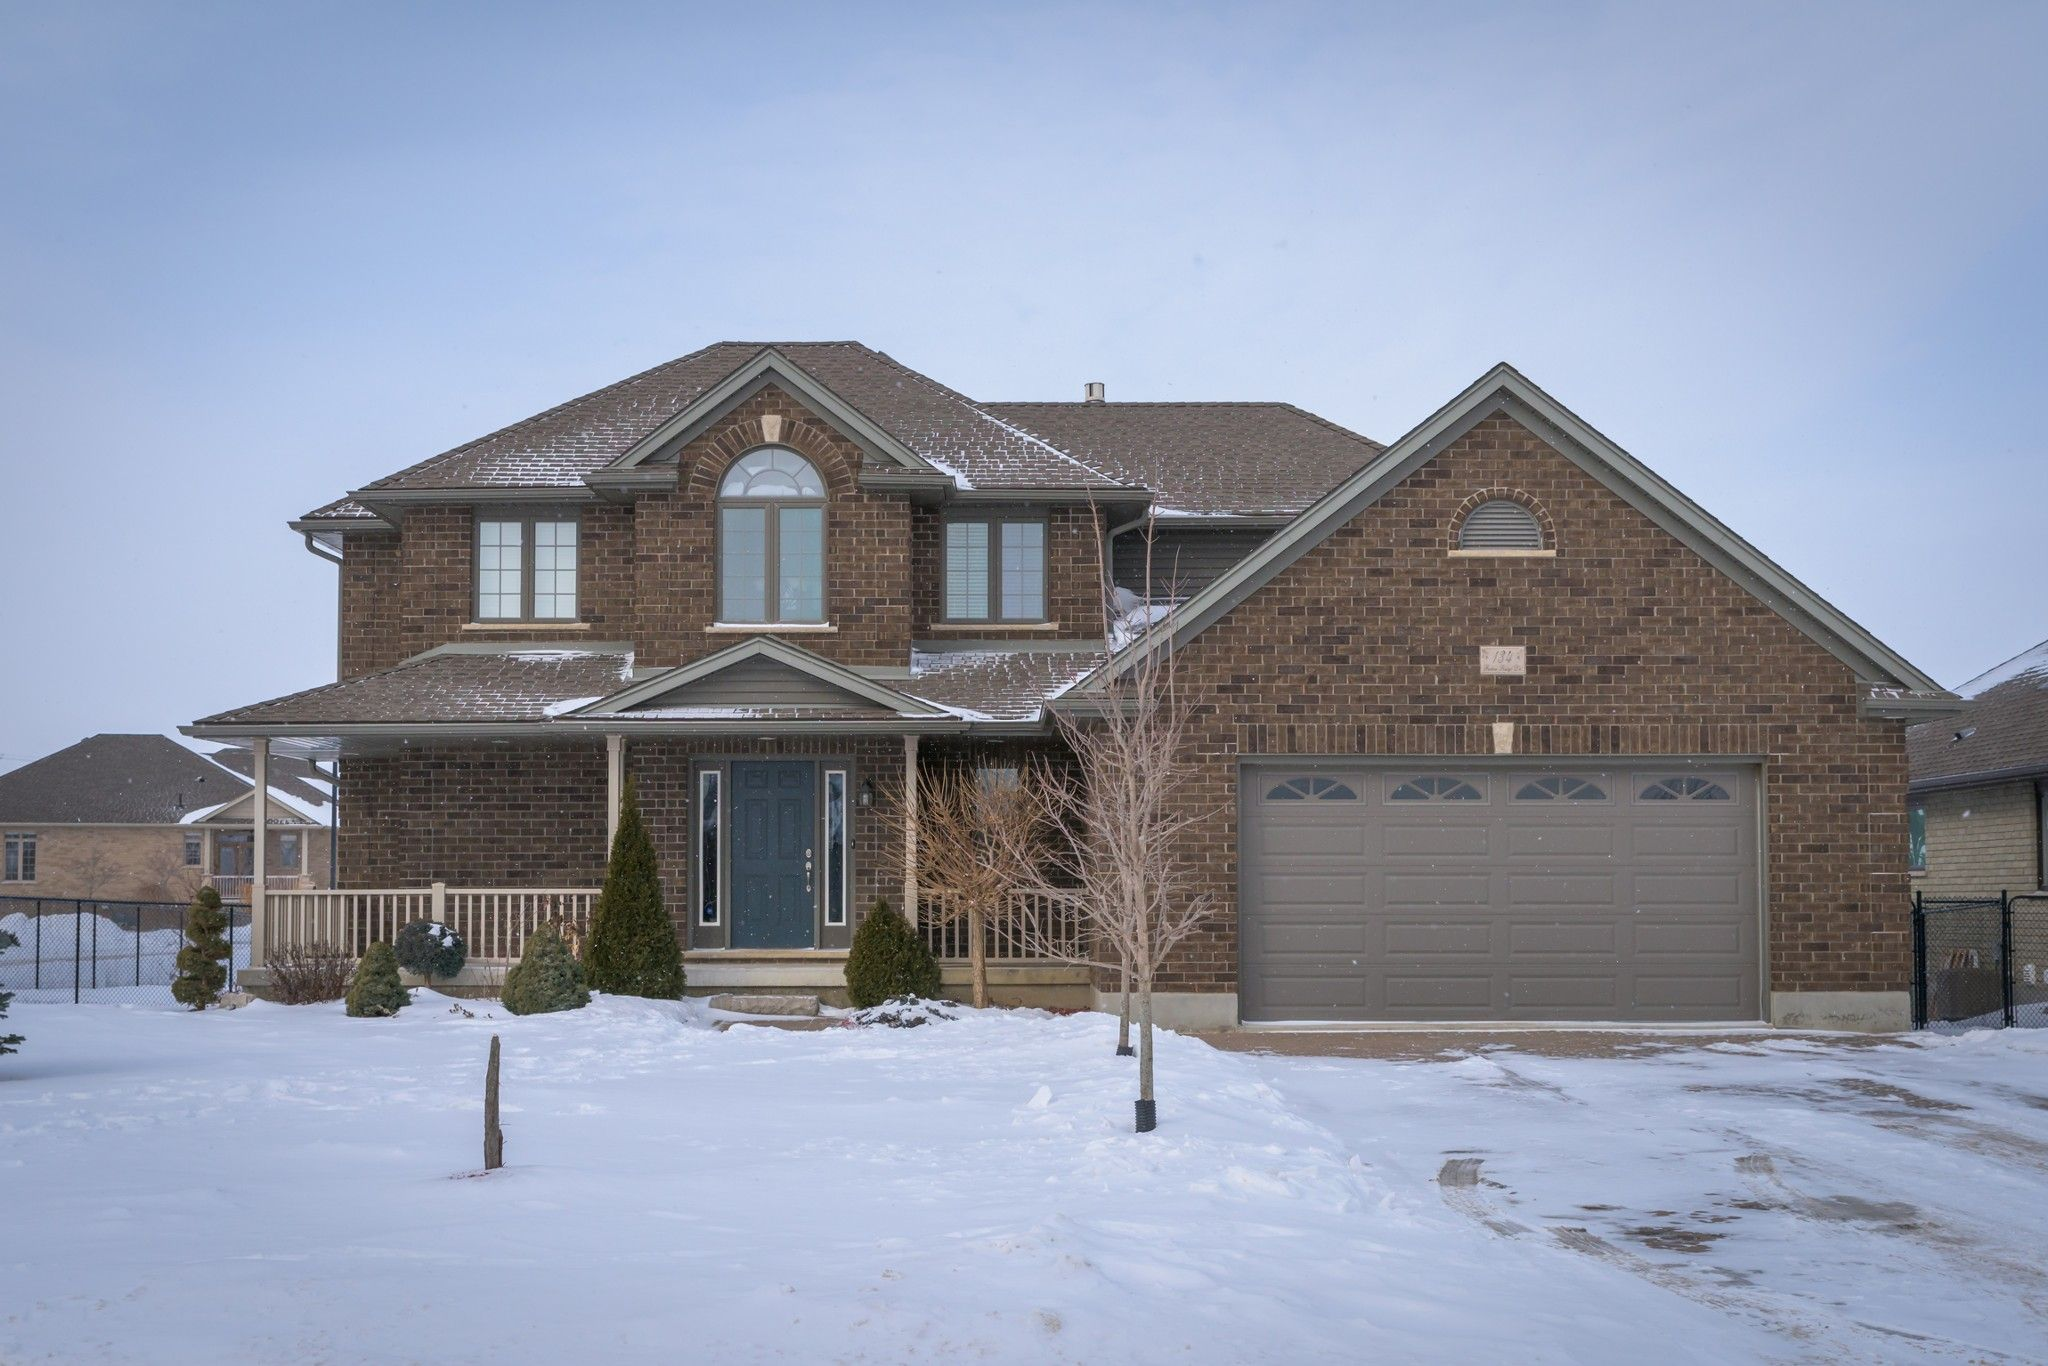 Main Photo: 134 Robin Ridge Drive in Belmont: Residential for sale : MLS®# 40067685